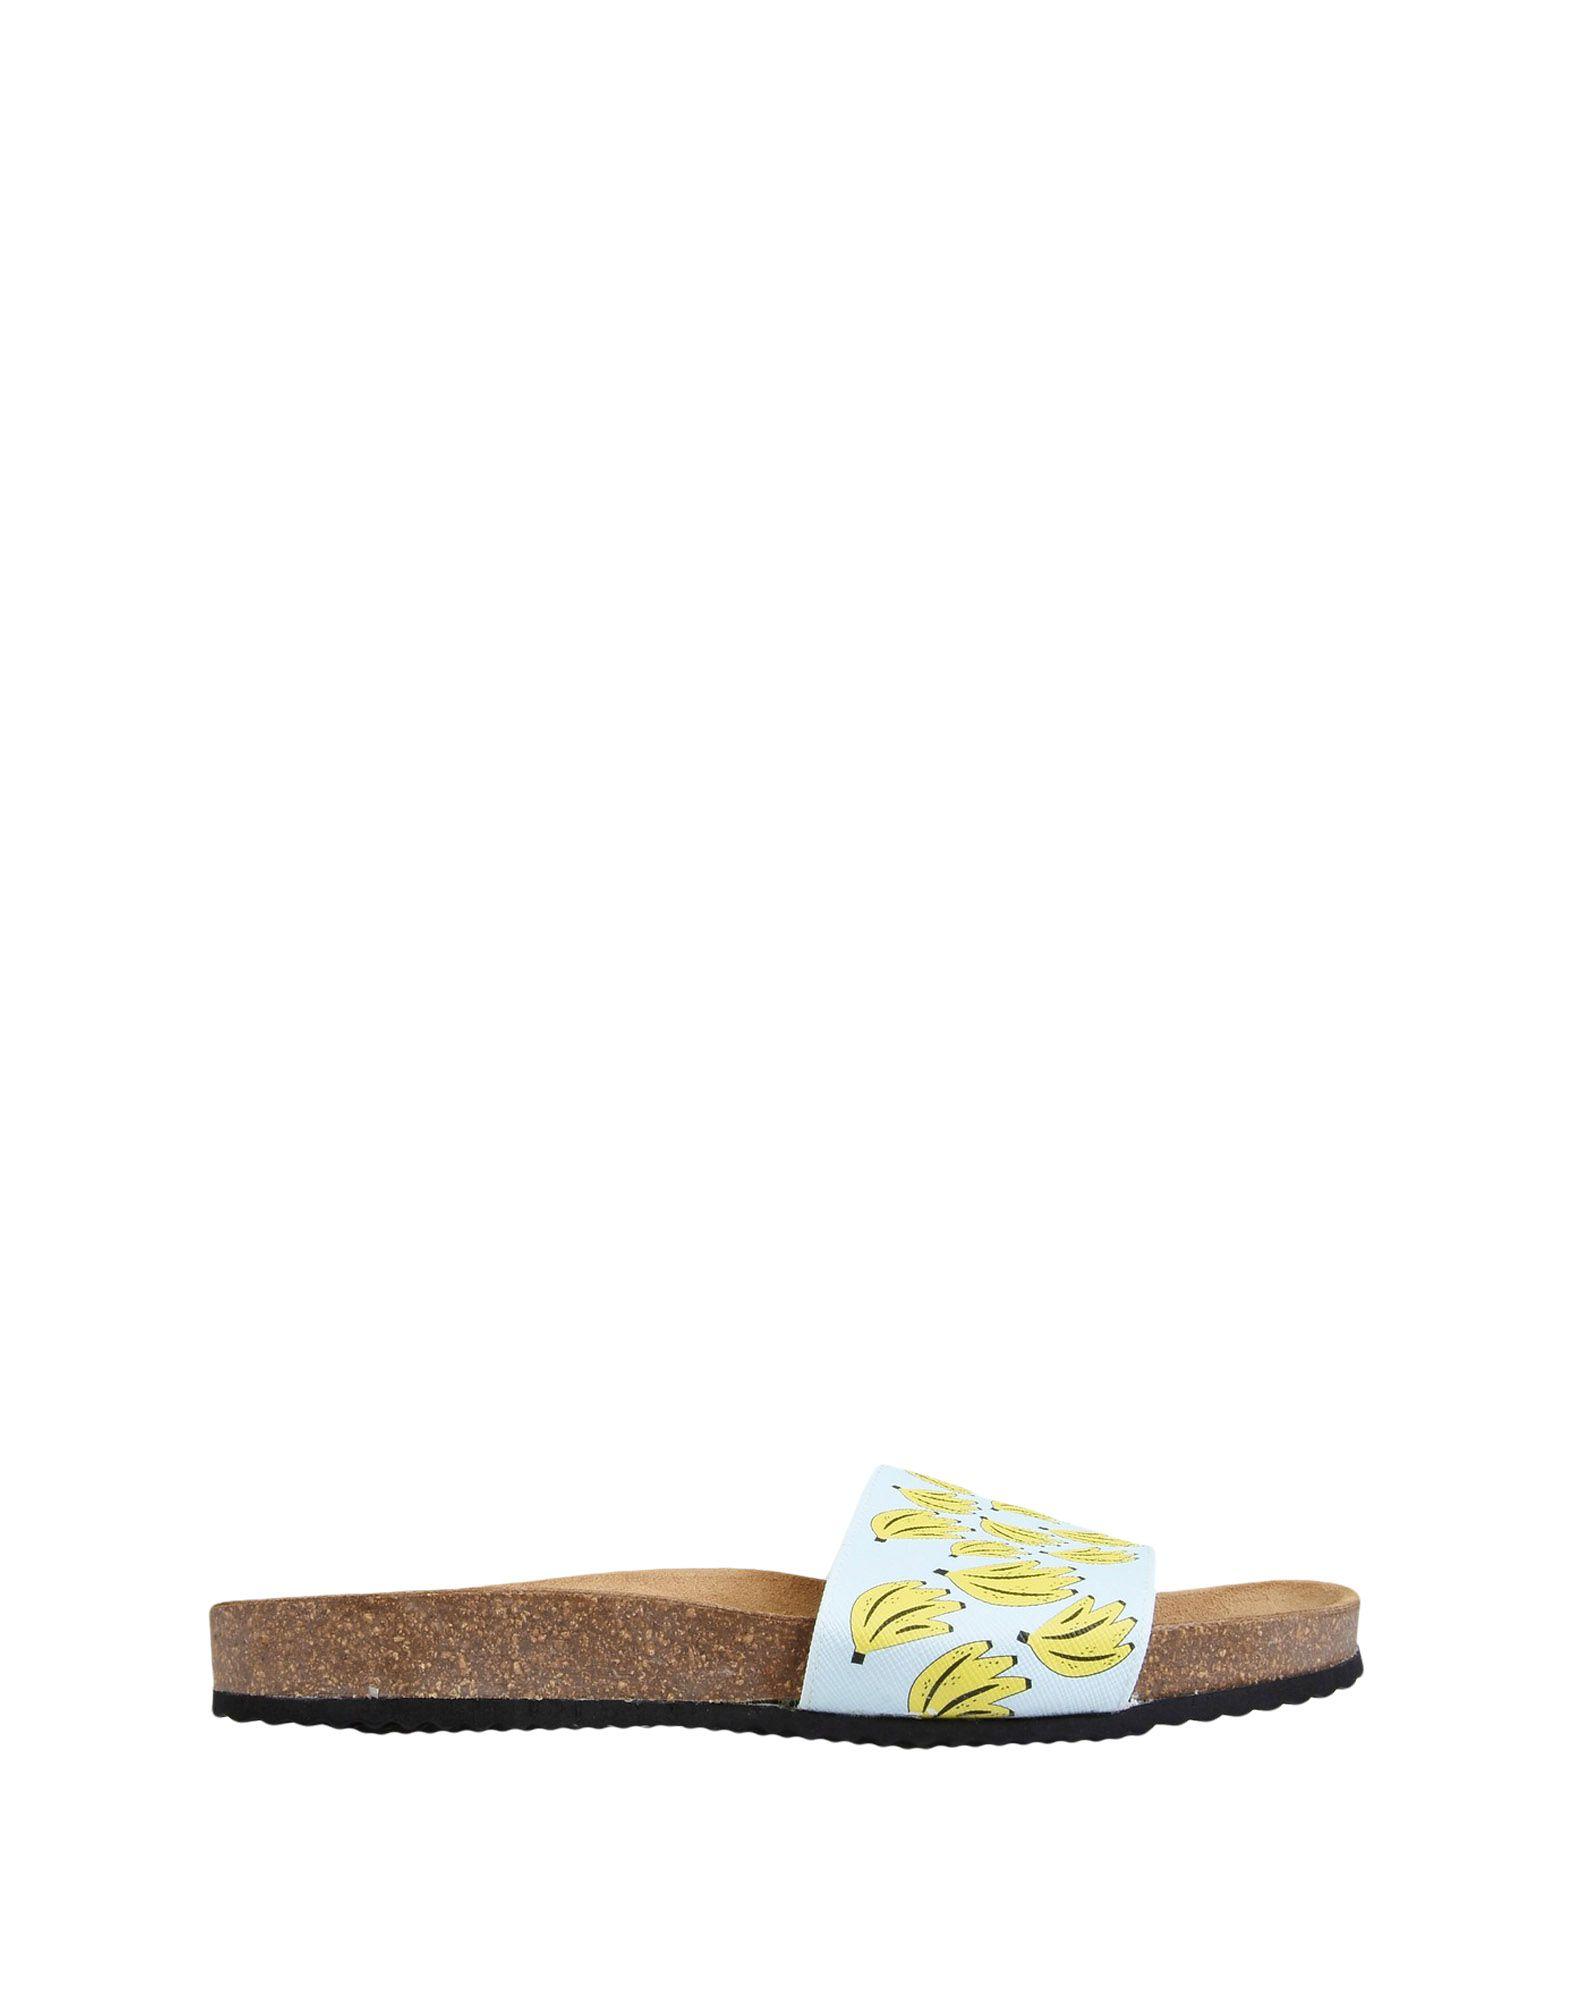 Sandales Leo Studio Design Ss17-601 Slipper Printed Bananas - Femme - Sandales Leo Studio Design sur